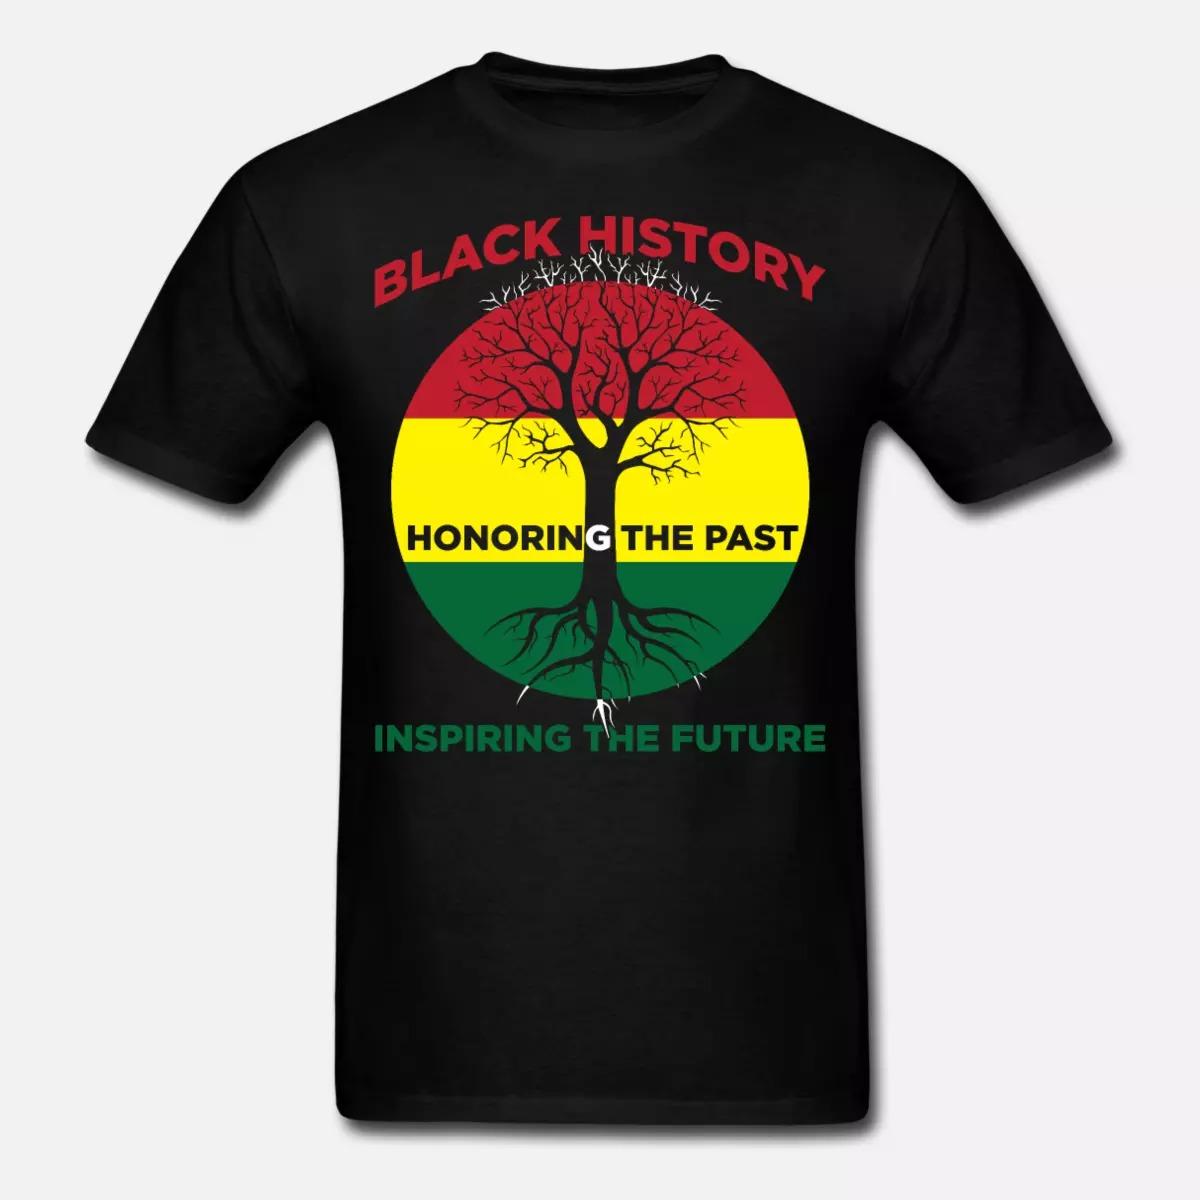 Black History Month Honoring The Past Inspiring The Future Shirt